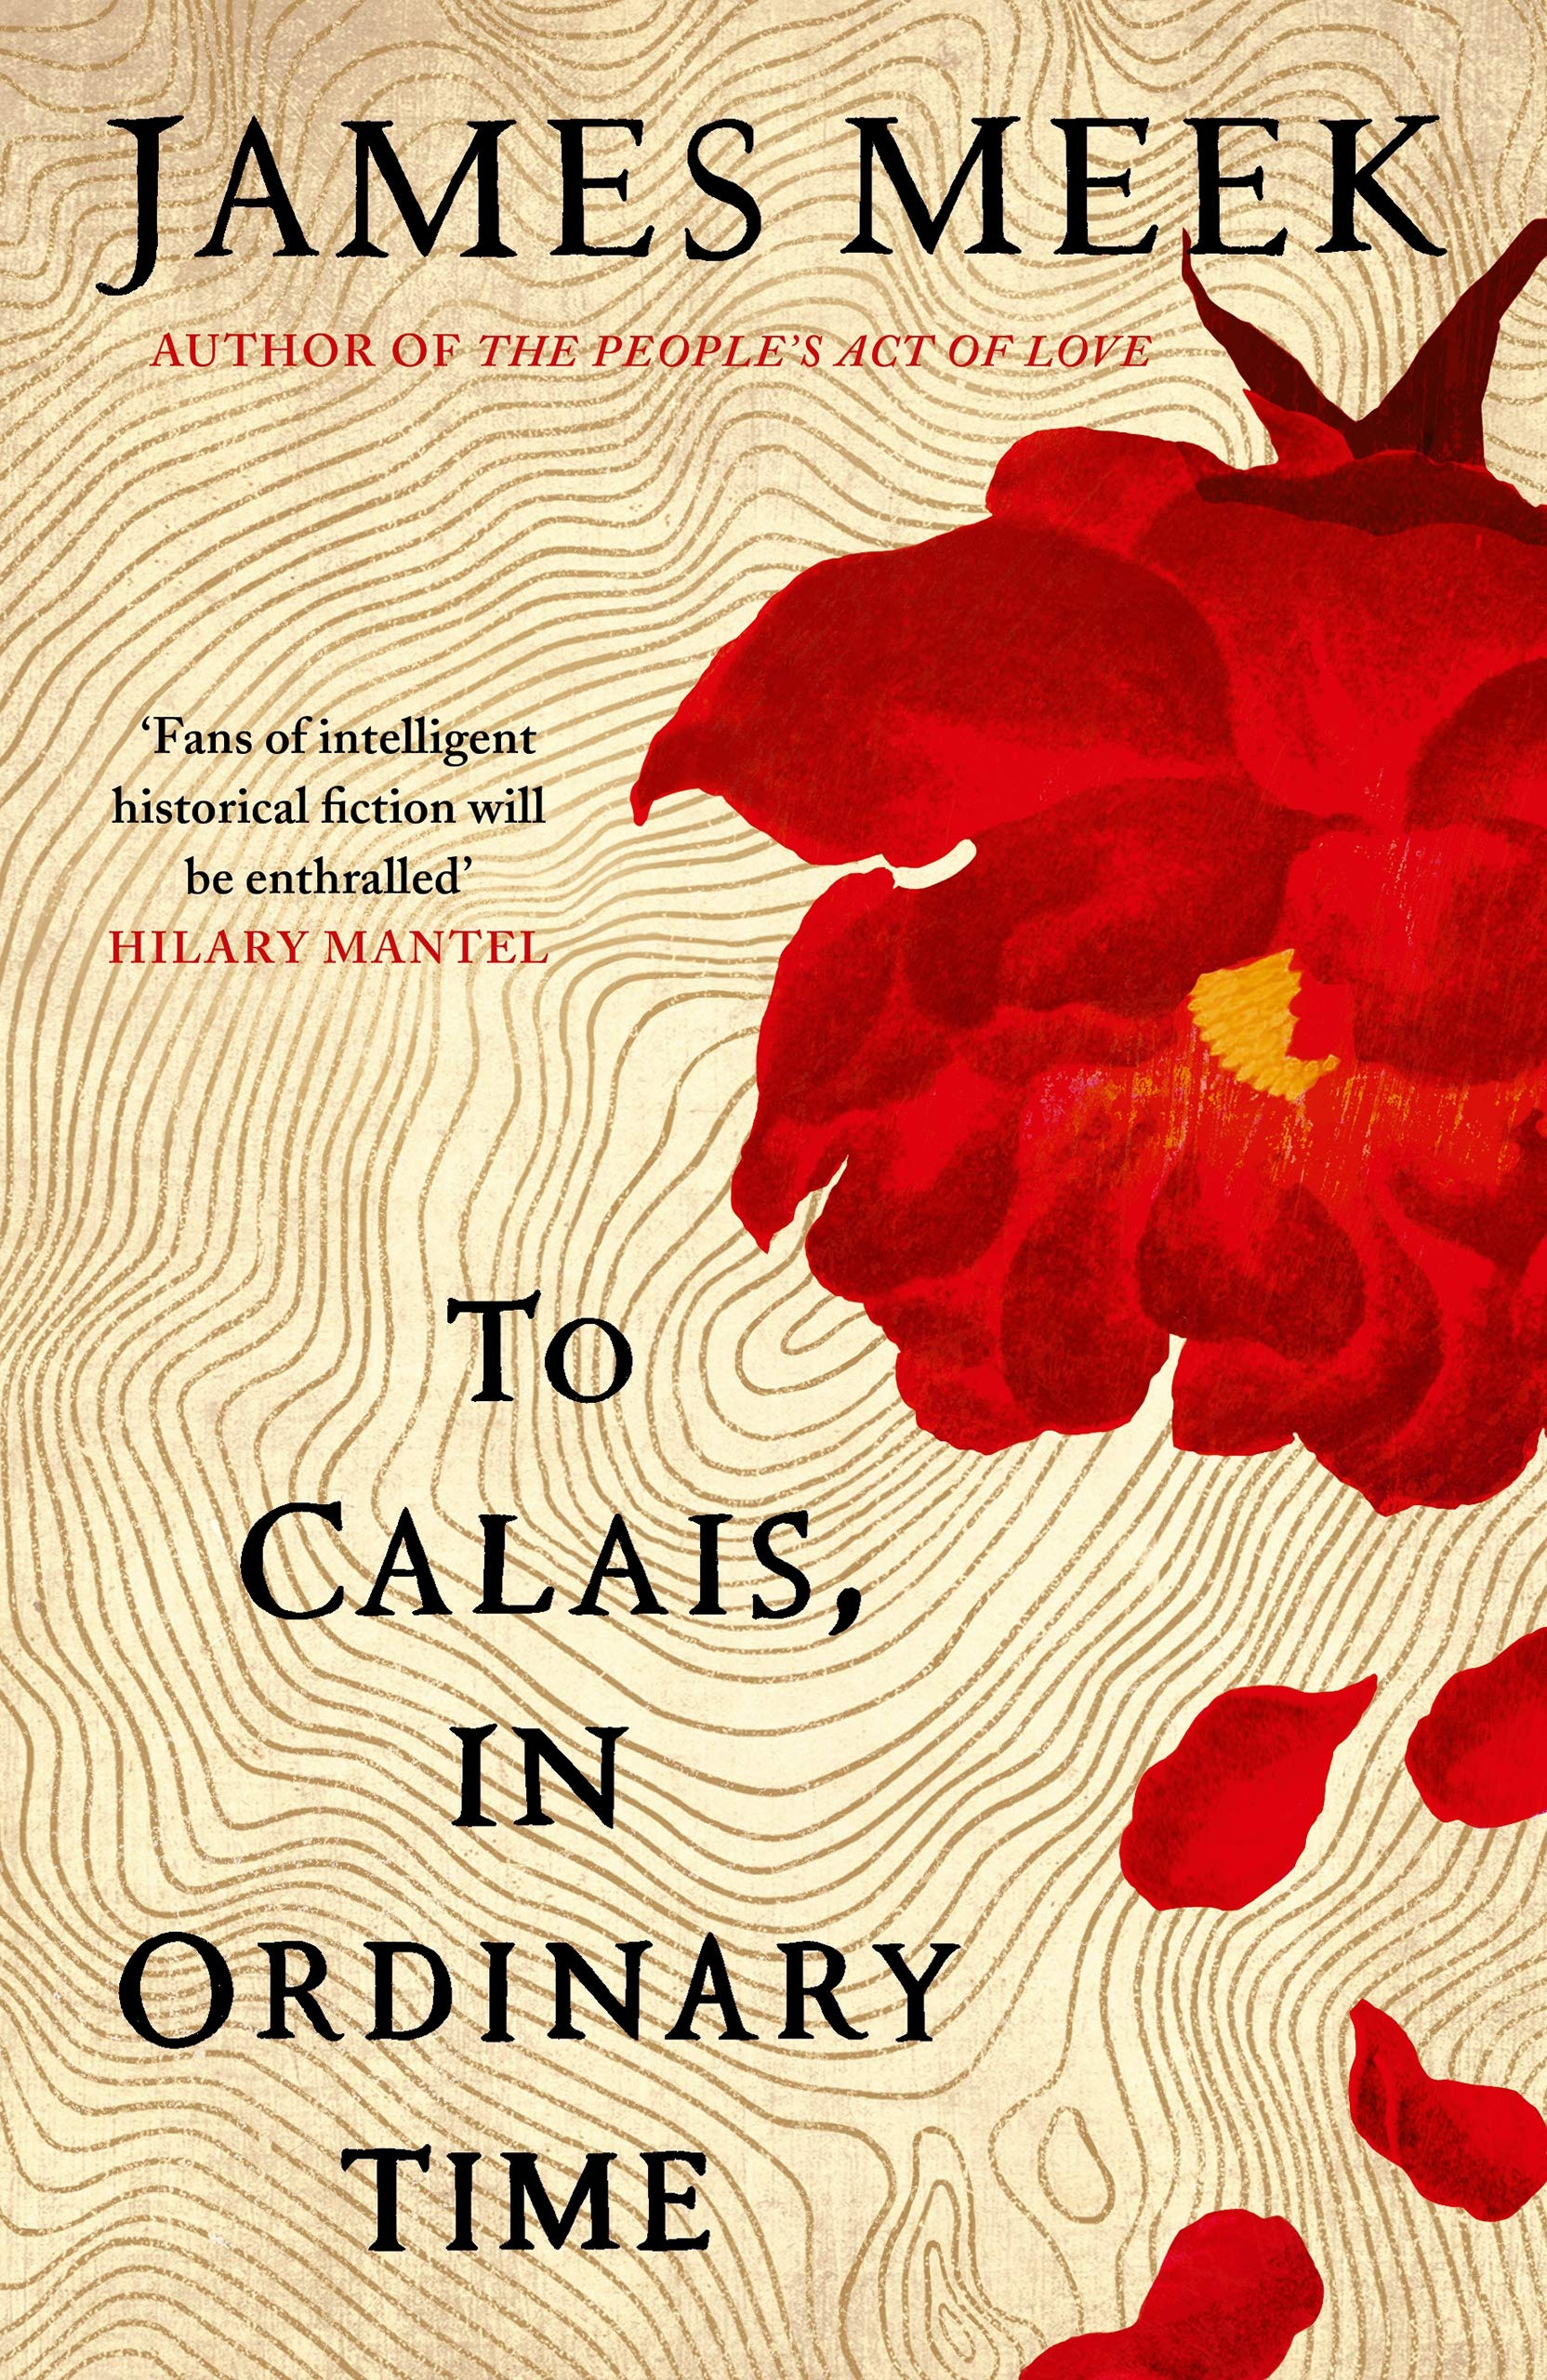 To Calais, in ordinary time – James Meek book novel cover design